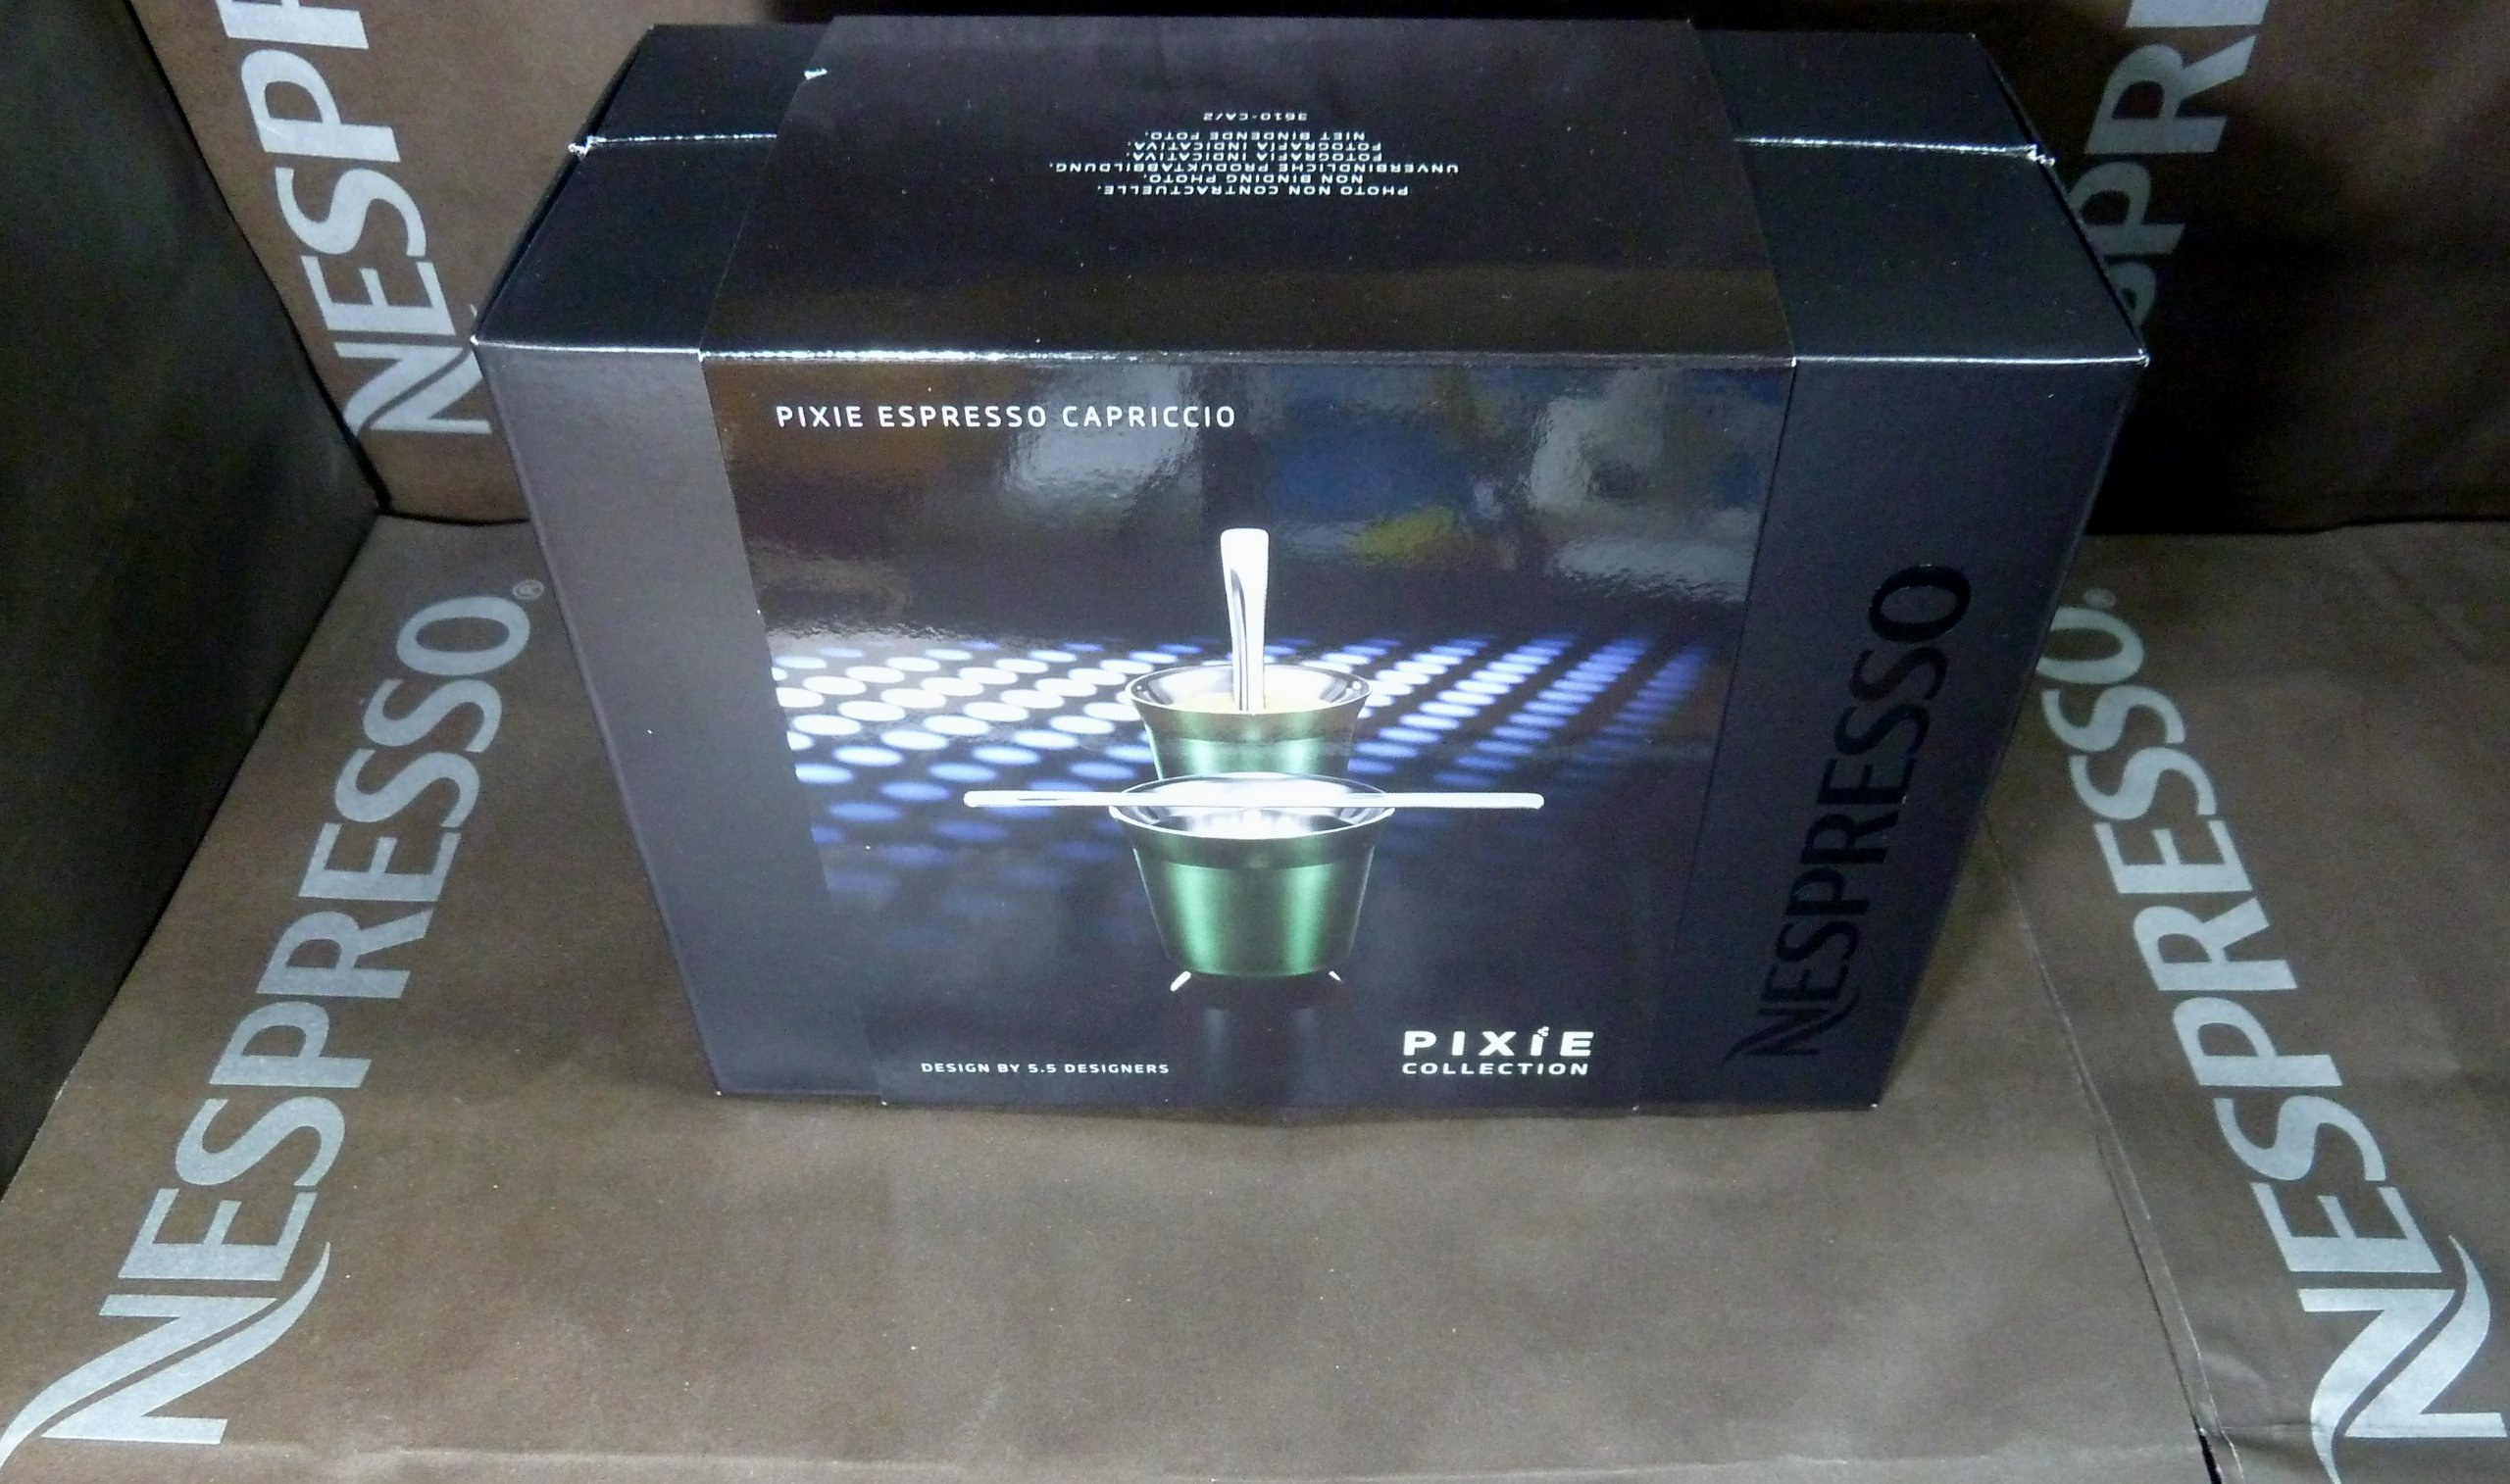 Nespresso Special Gift Set 2 Pixie Espresso Capriccio Cups & Stirrers , In Brand Box , New by Nespresso (Image #2)